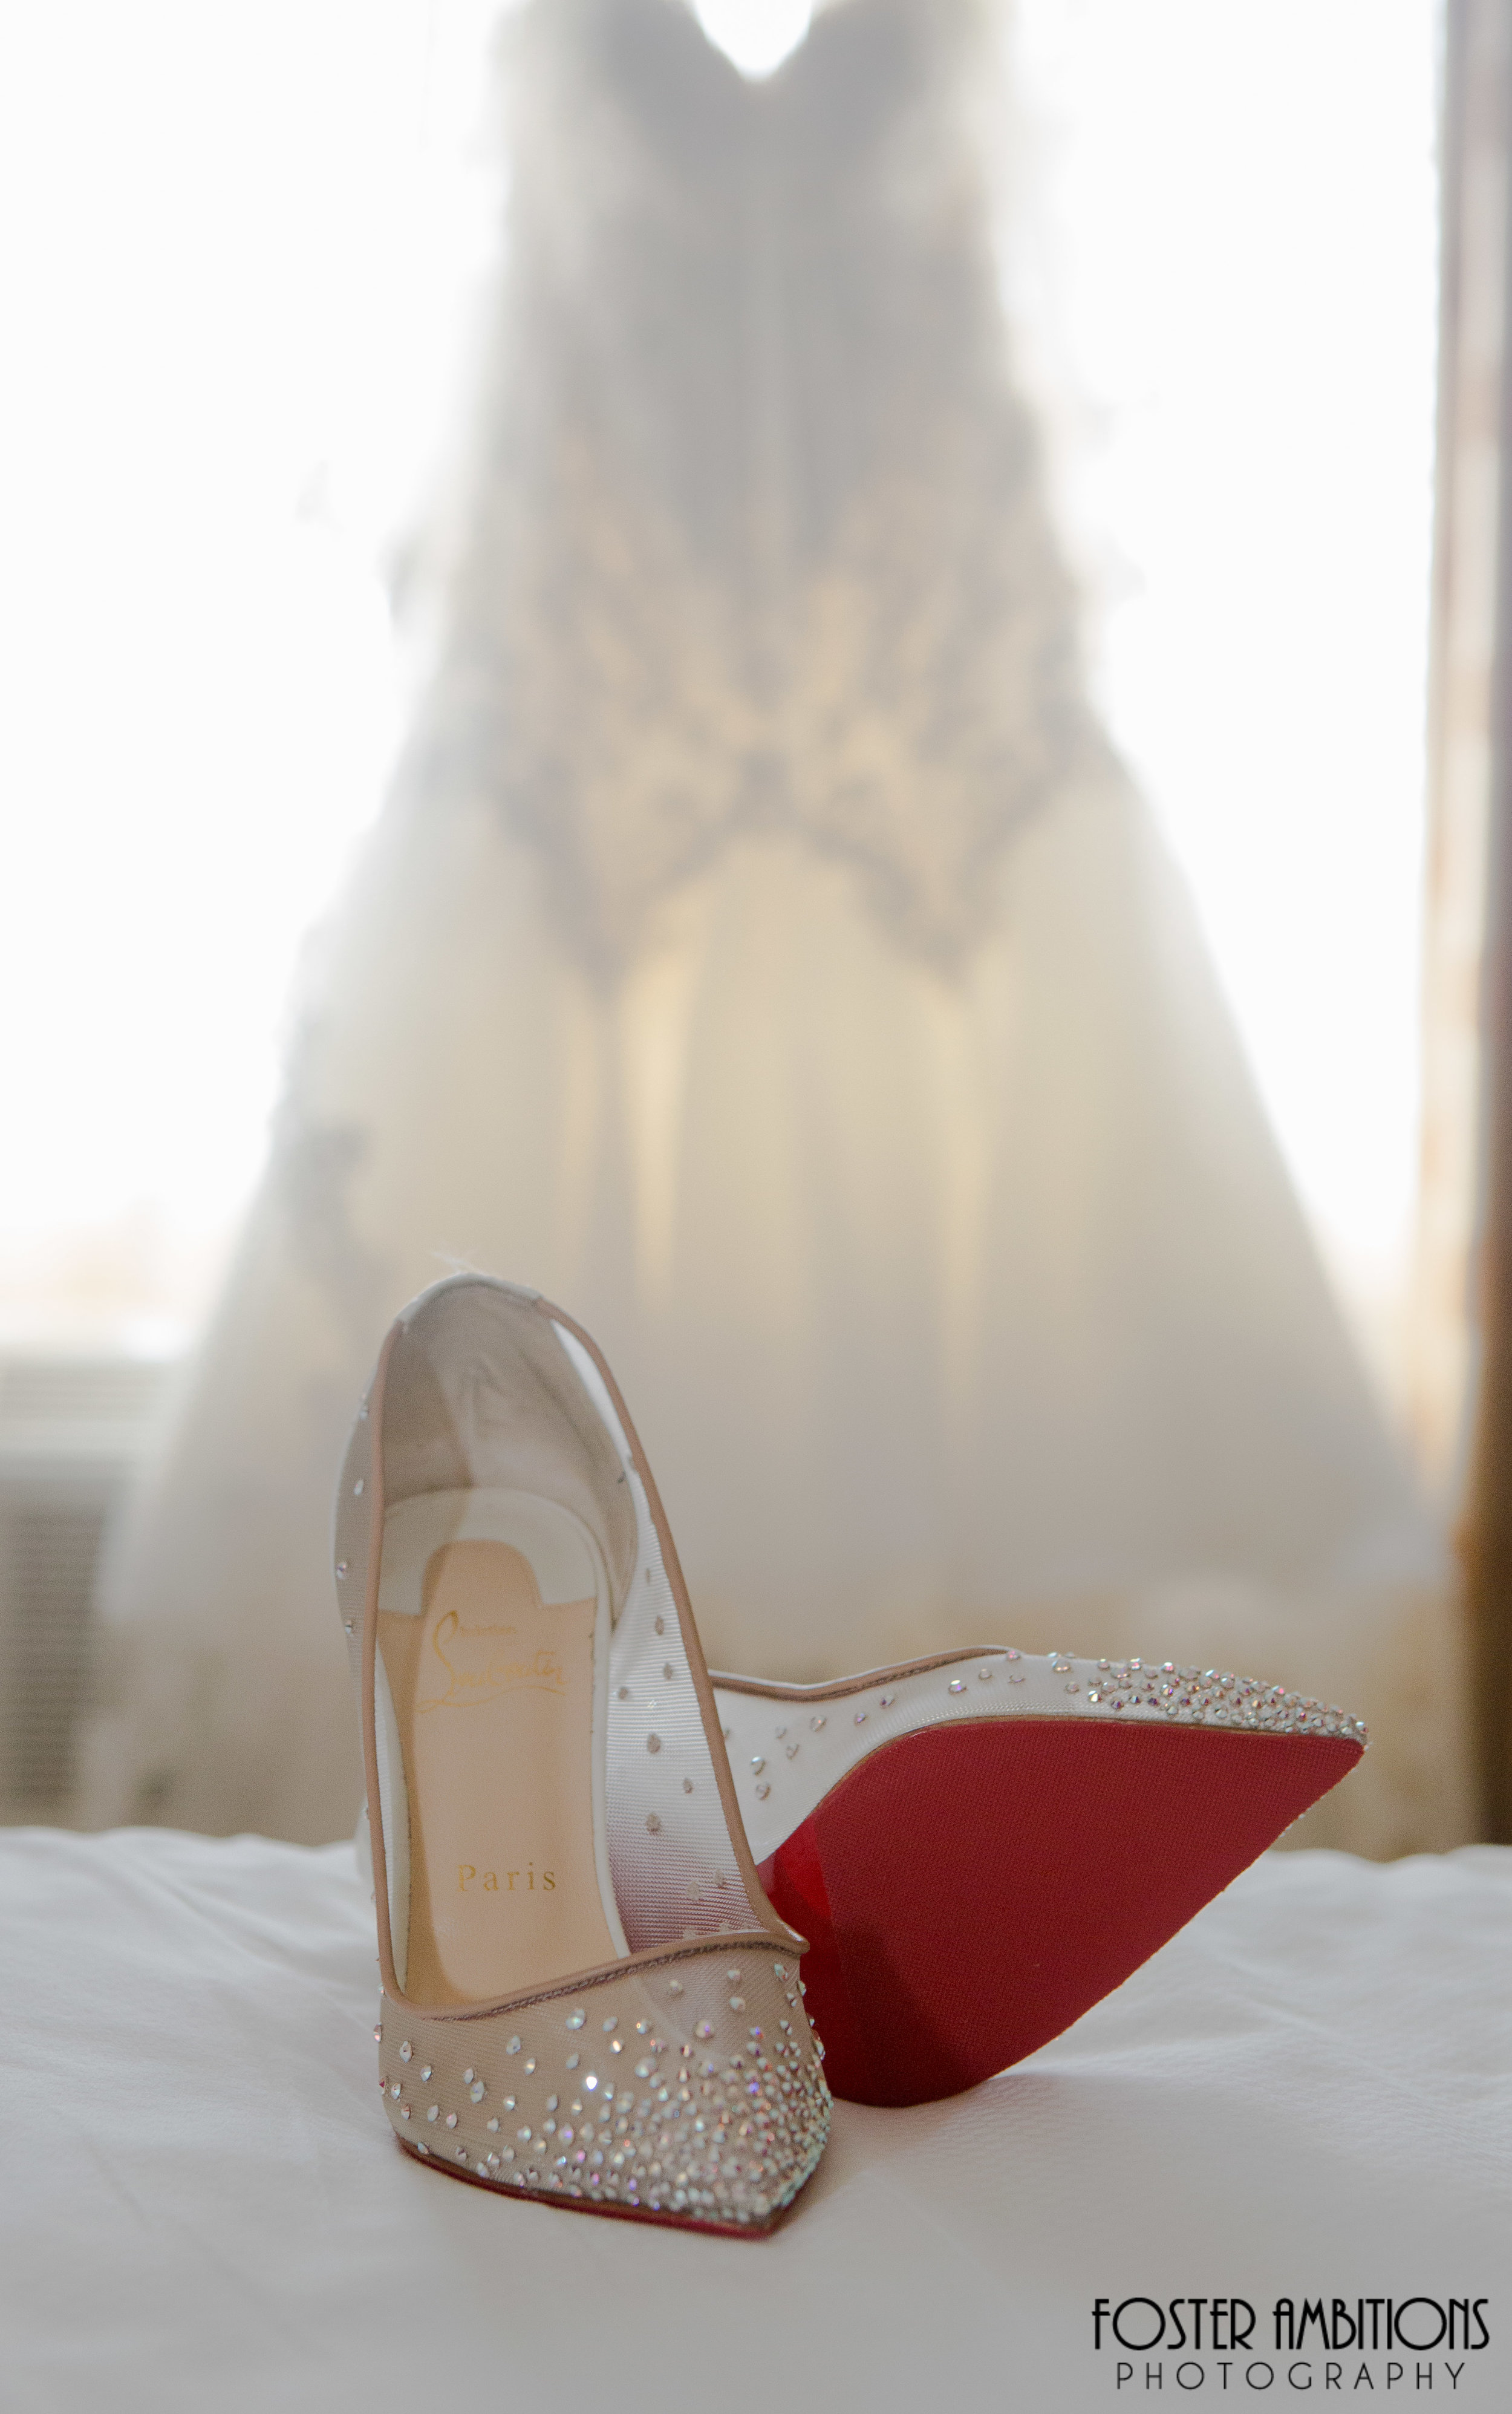 Brittany-Michael-Louboutin-Wedding-Shoes-1.JPG